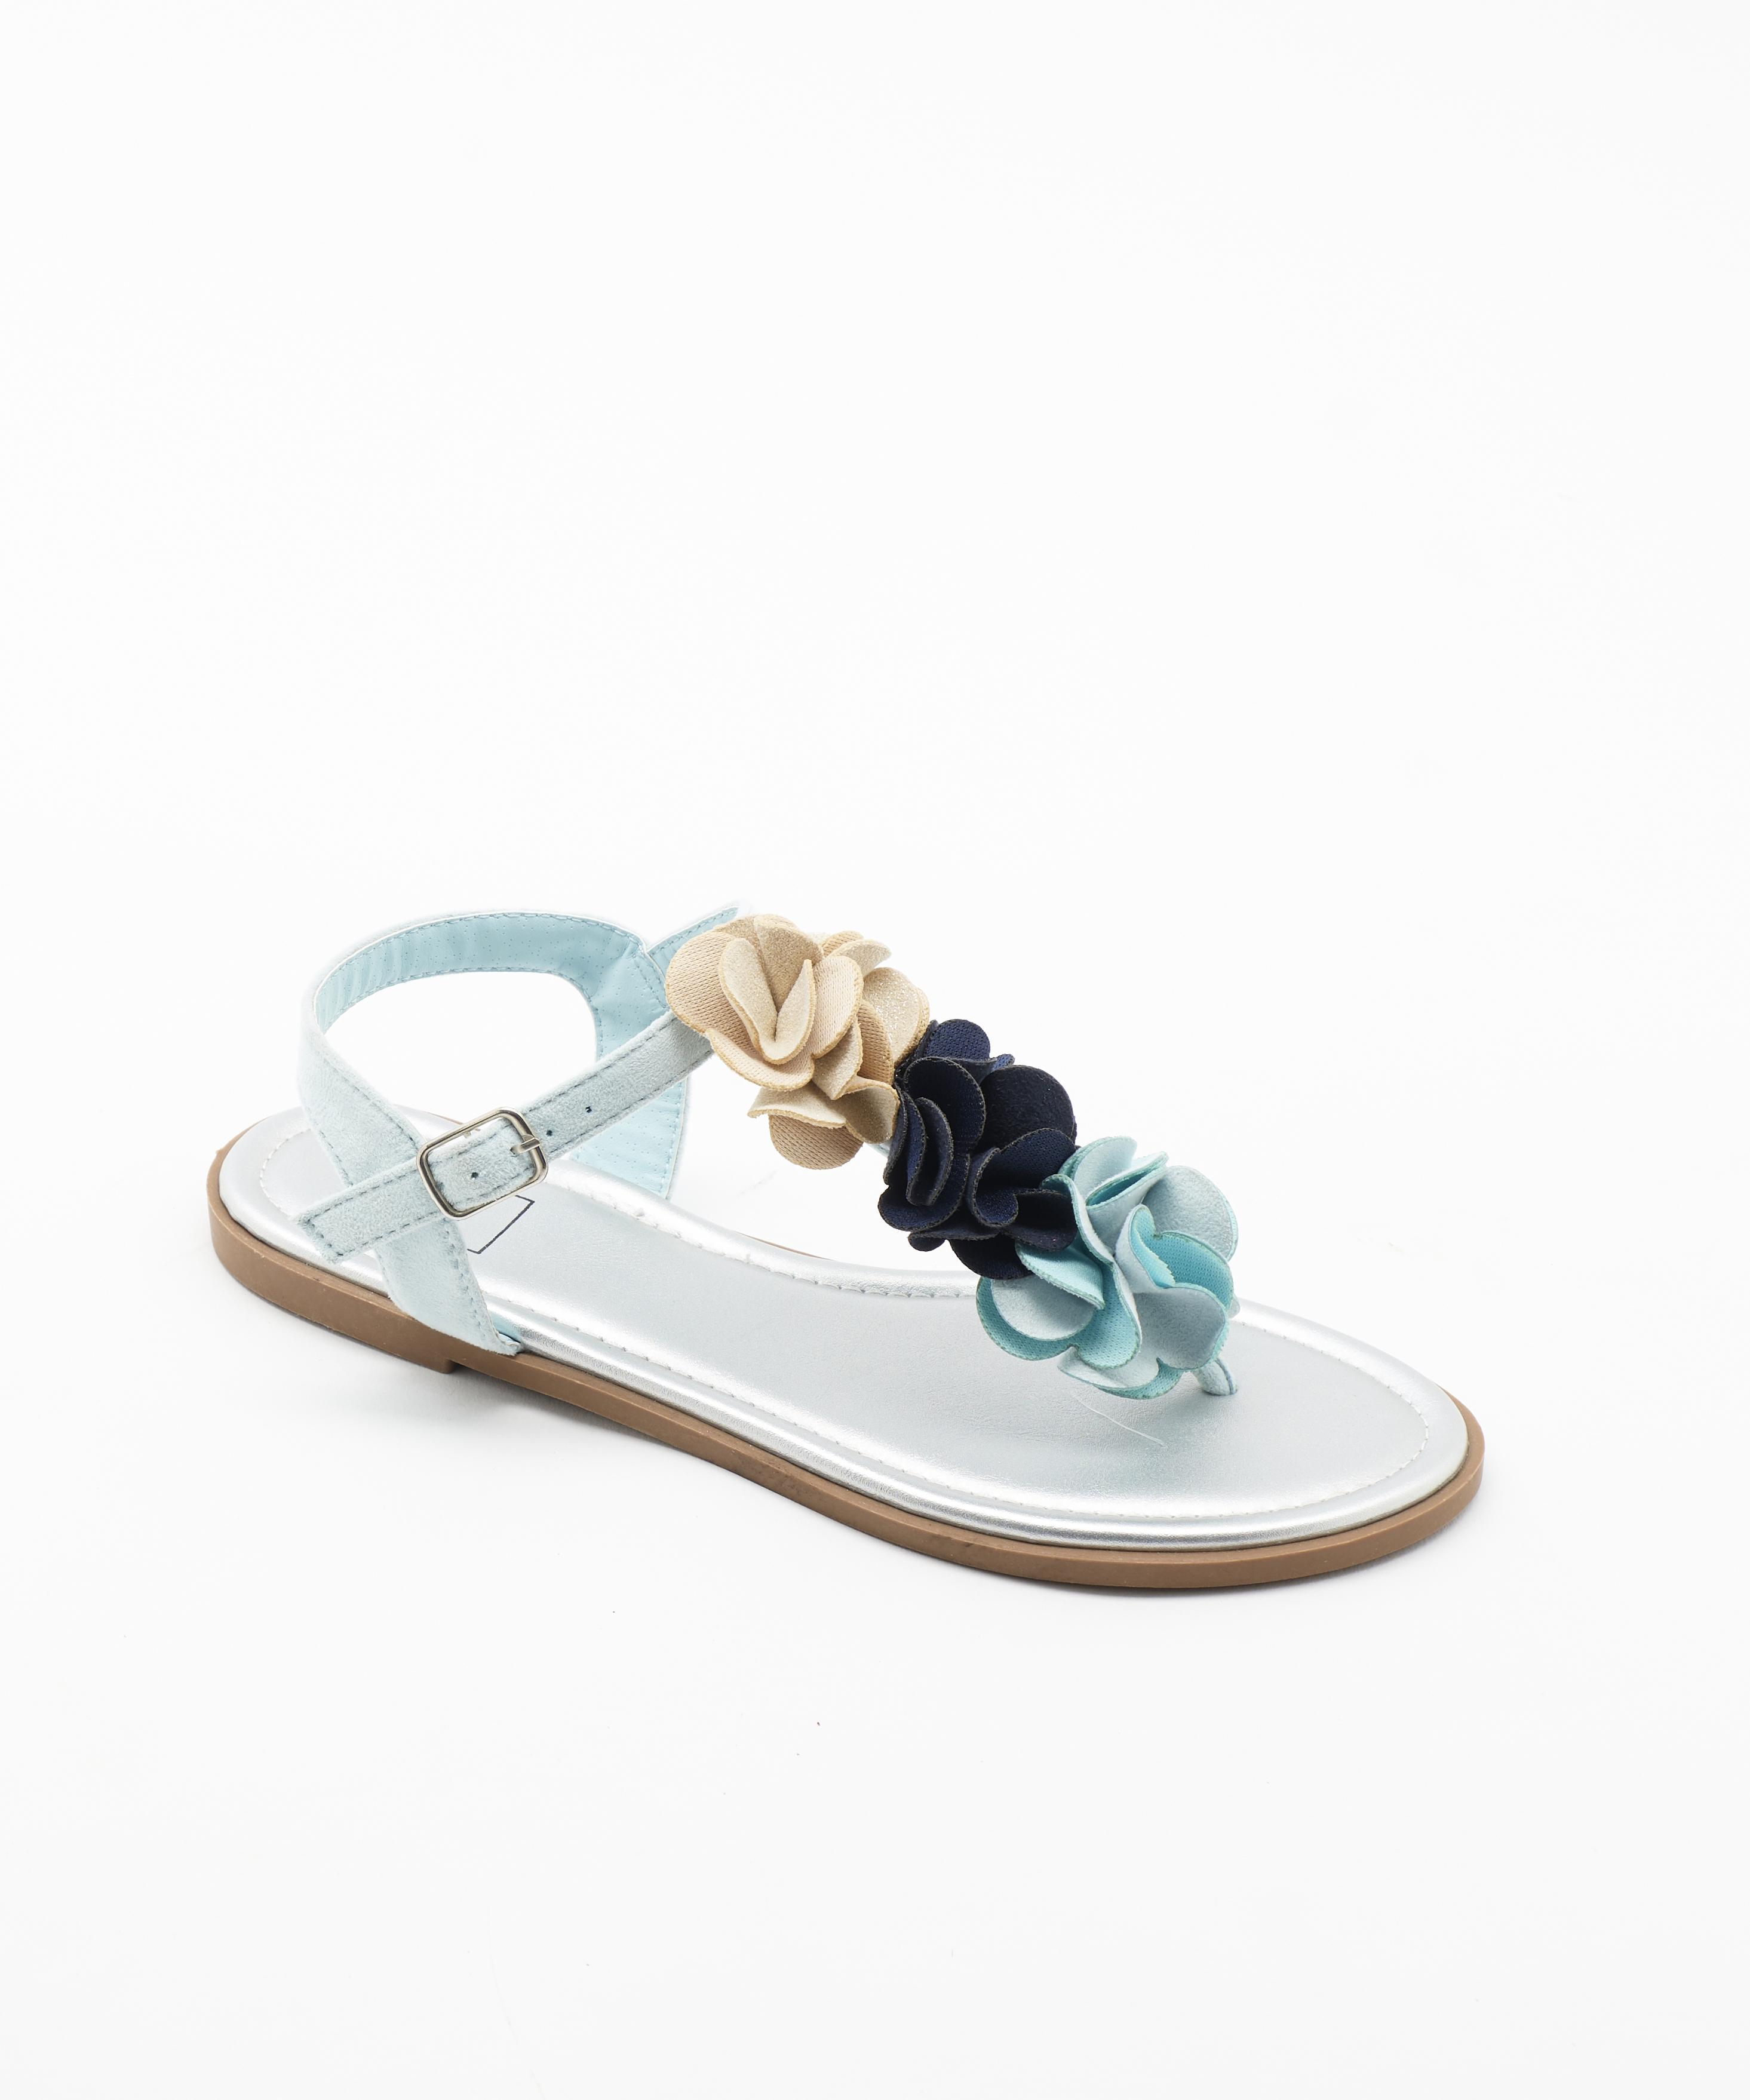 Sandales Fille - Sandale Ouverte Marine Jina - Style 6